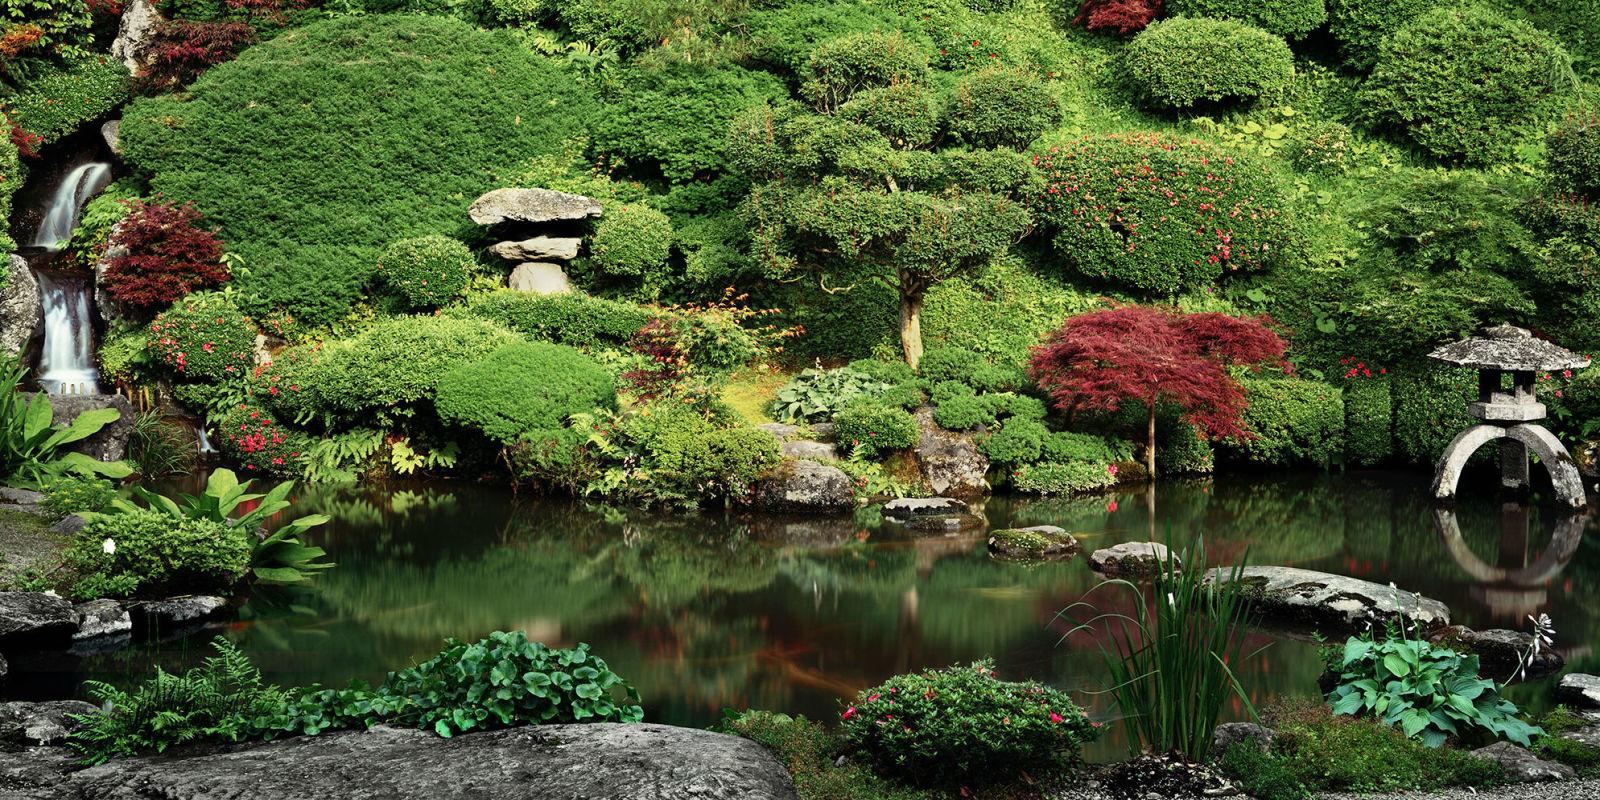 Giardino giapponese roma tutte le info - Giardini giapponesi ...